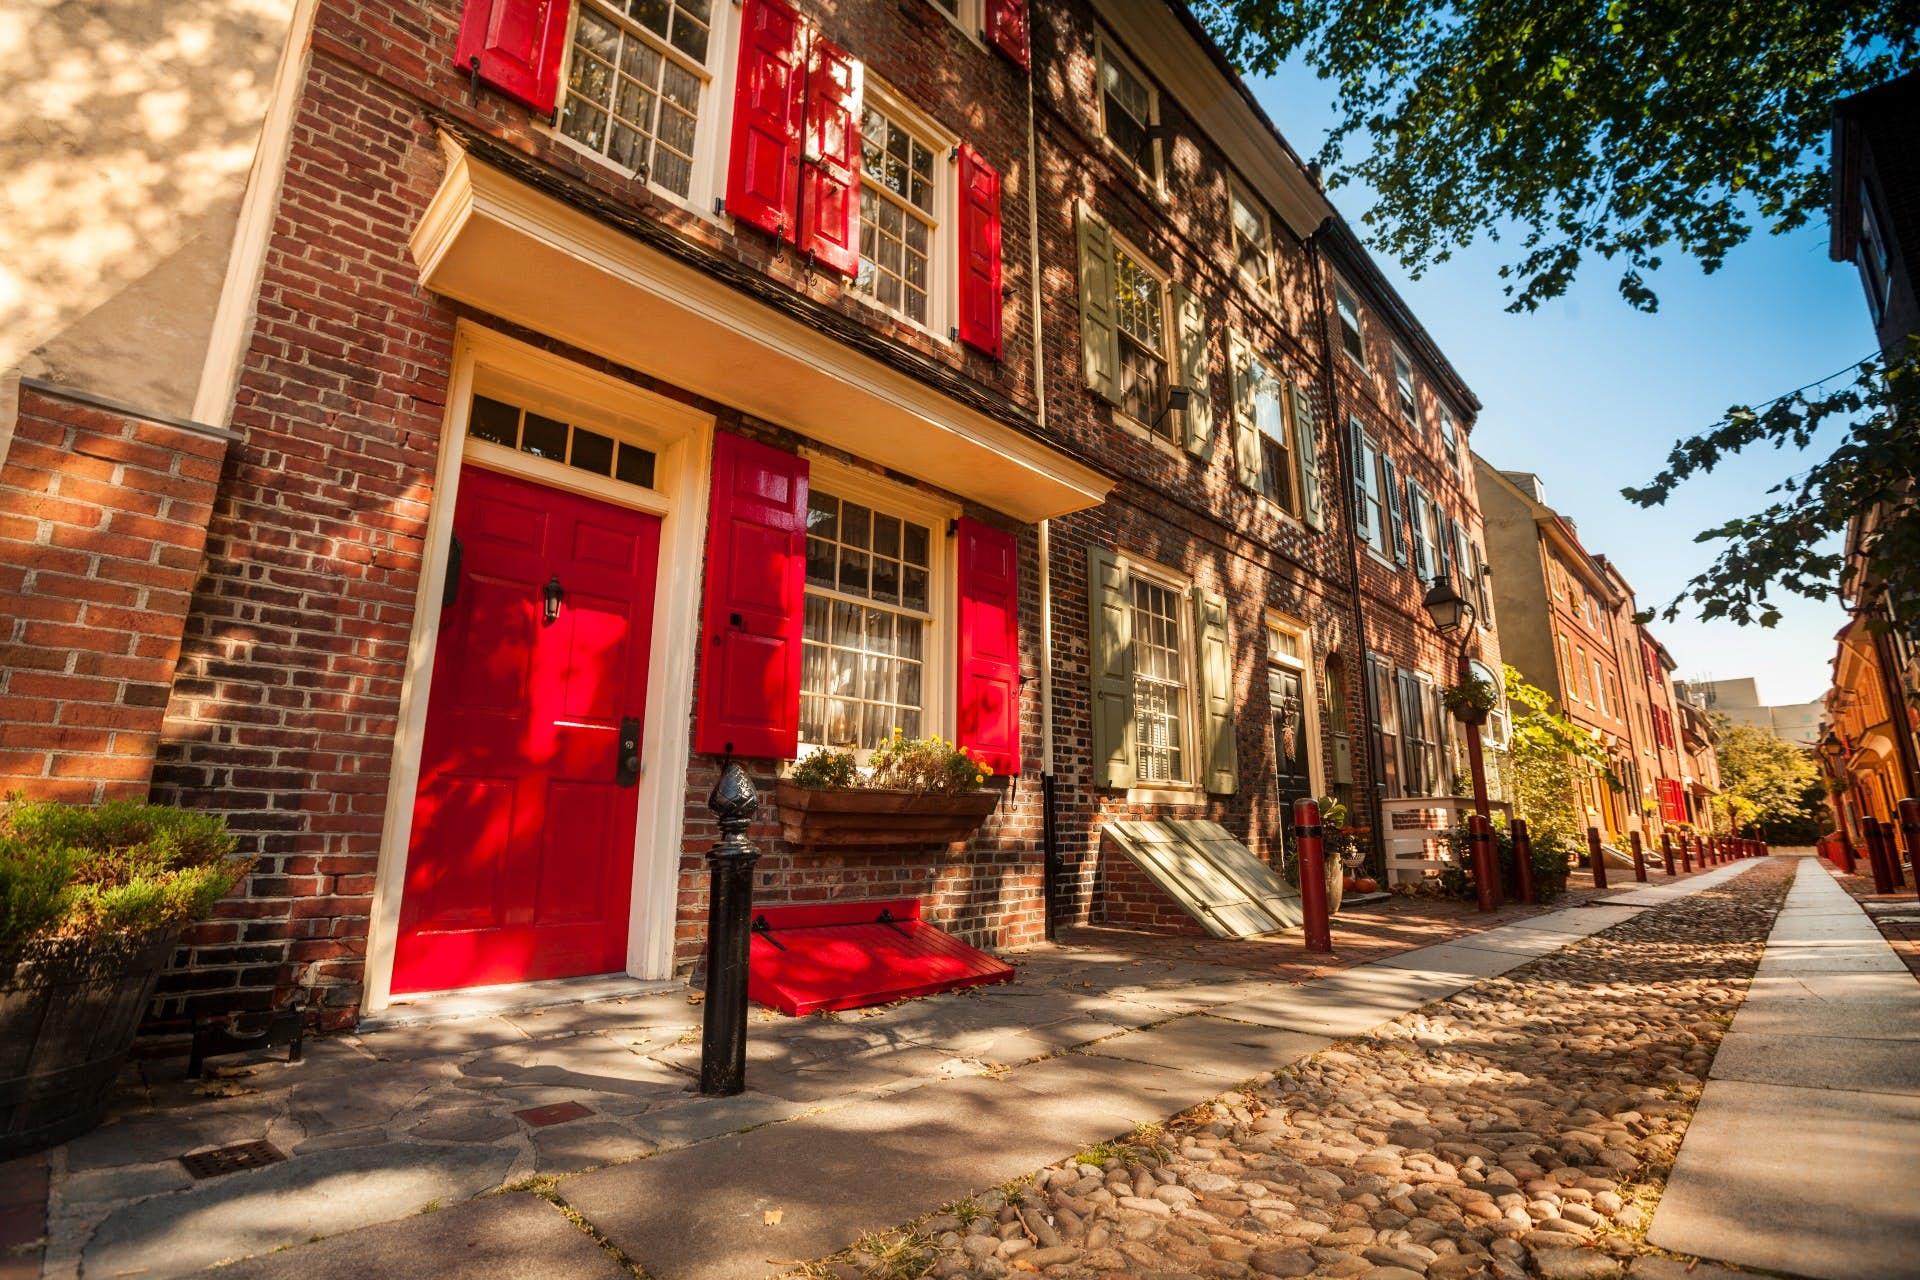 Philadelphia Old Town: Solve the Case image